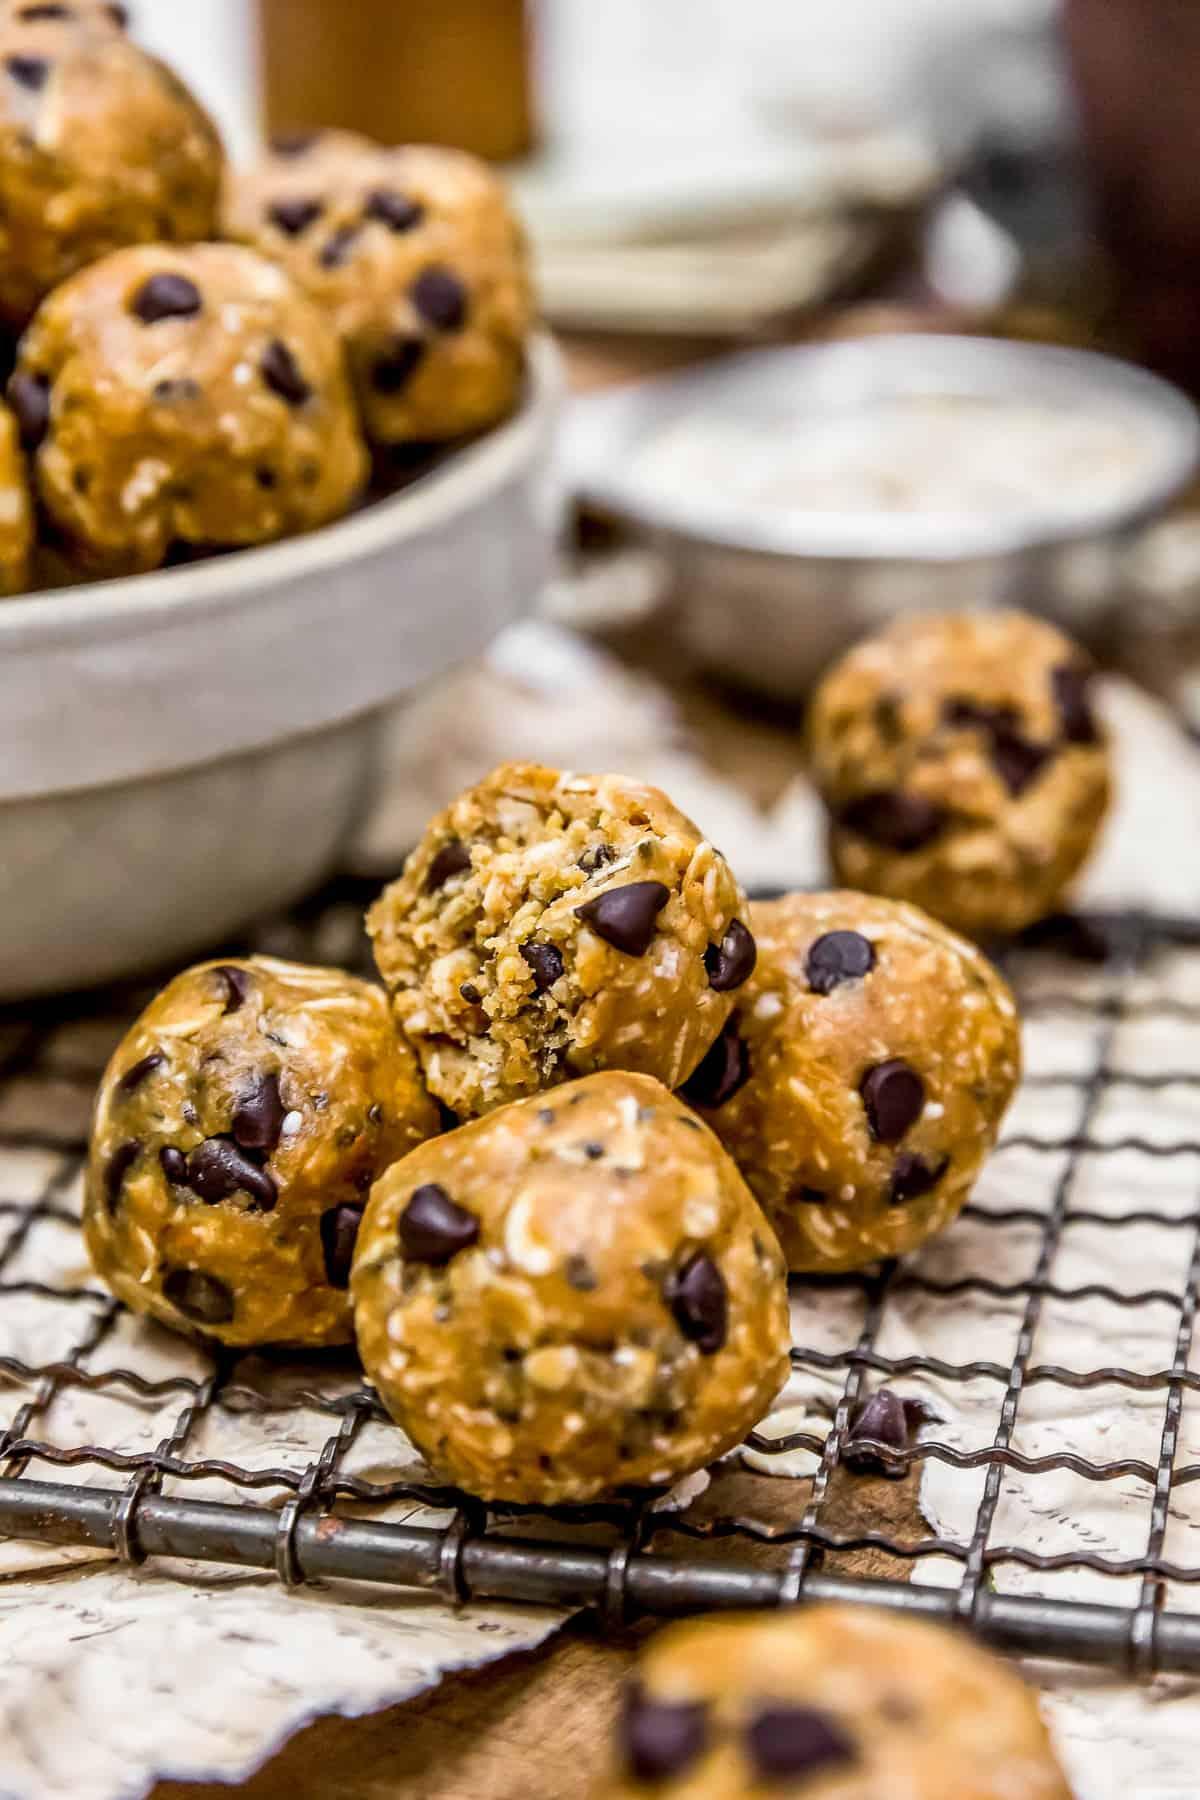 Bite of Vegan No-Bake Lactation Cookie